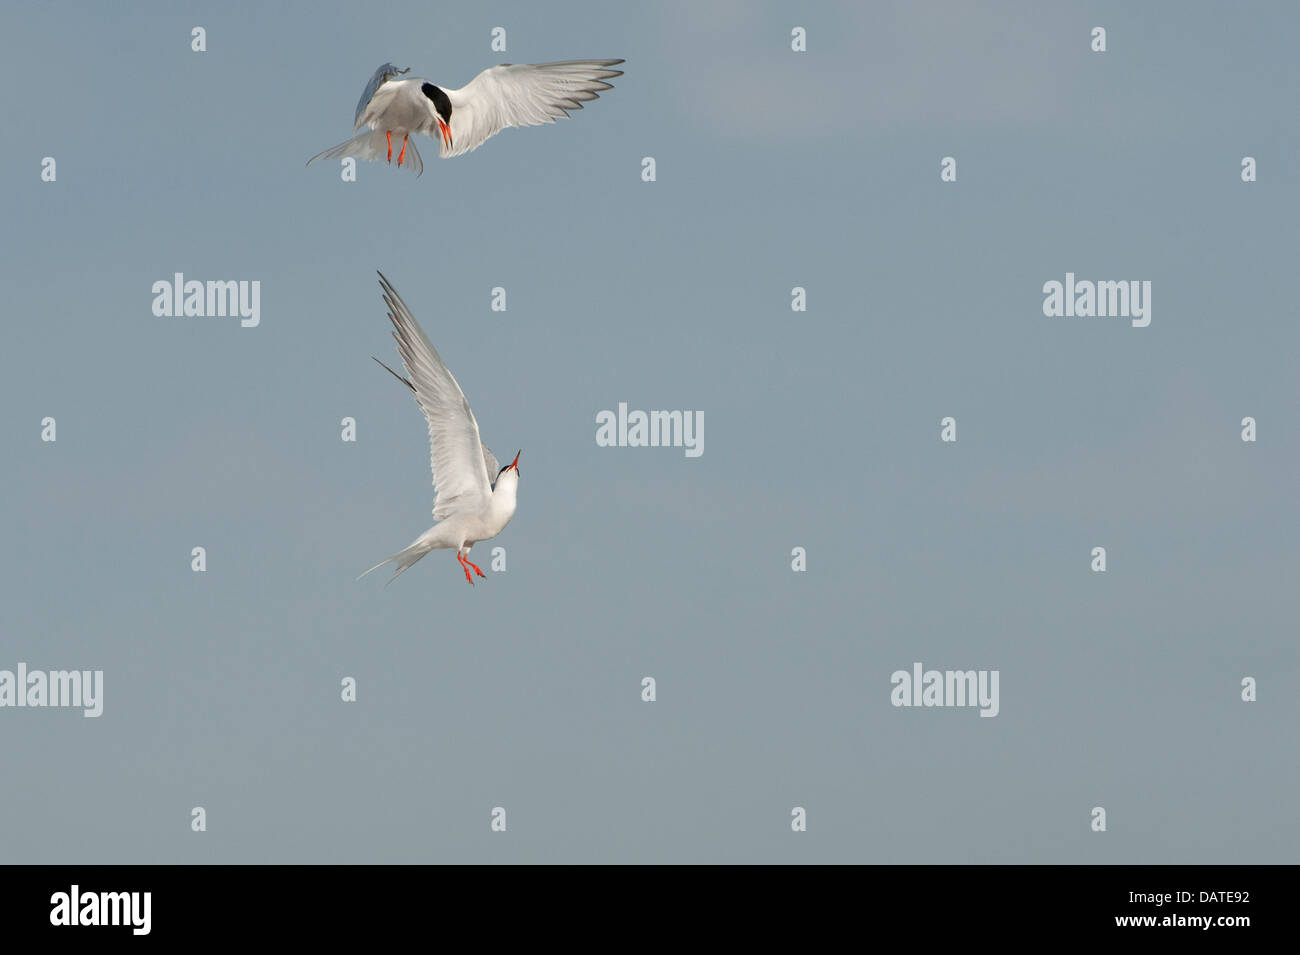 Common terns in aerial skirmish - Stock Image